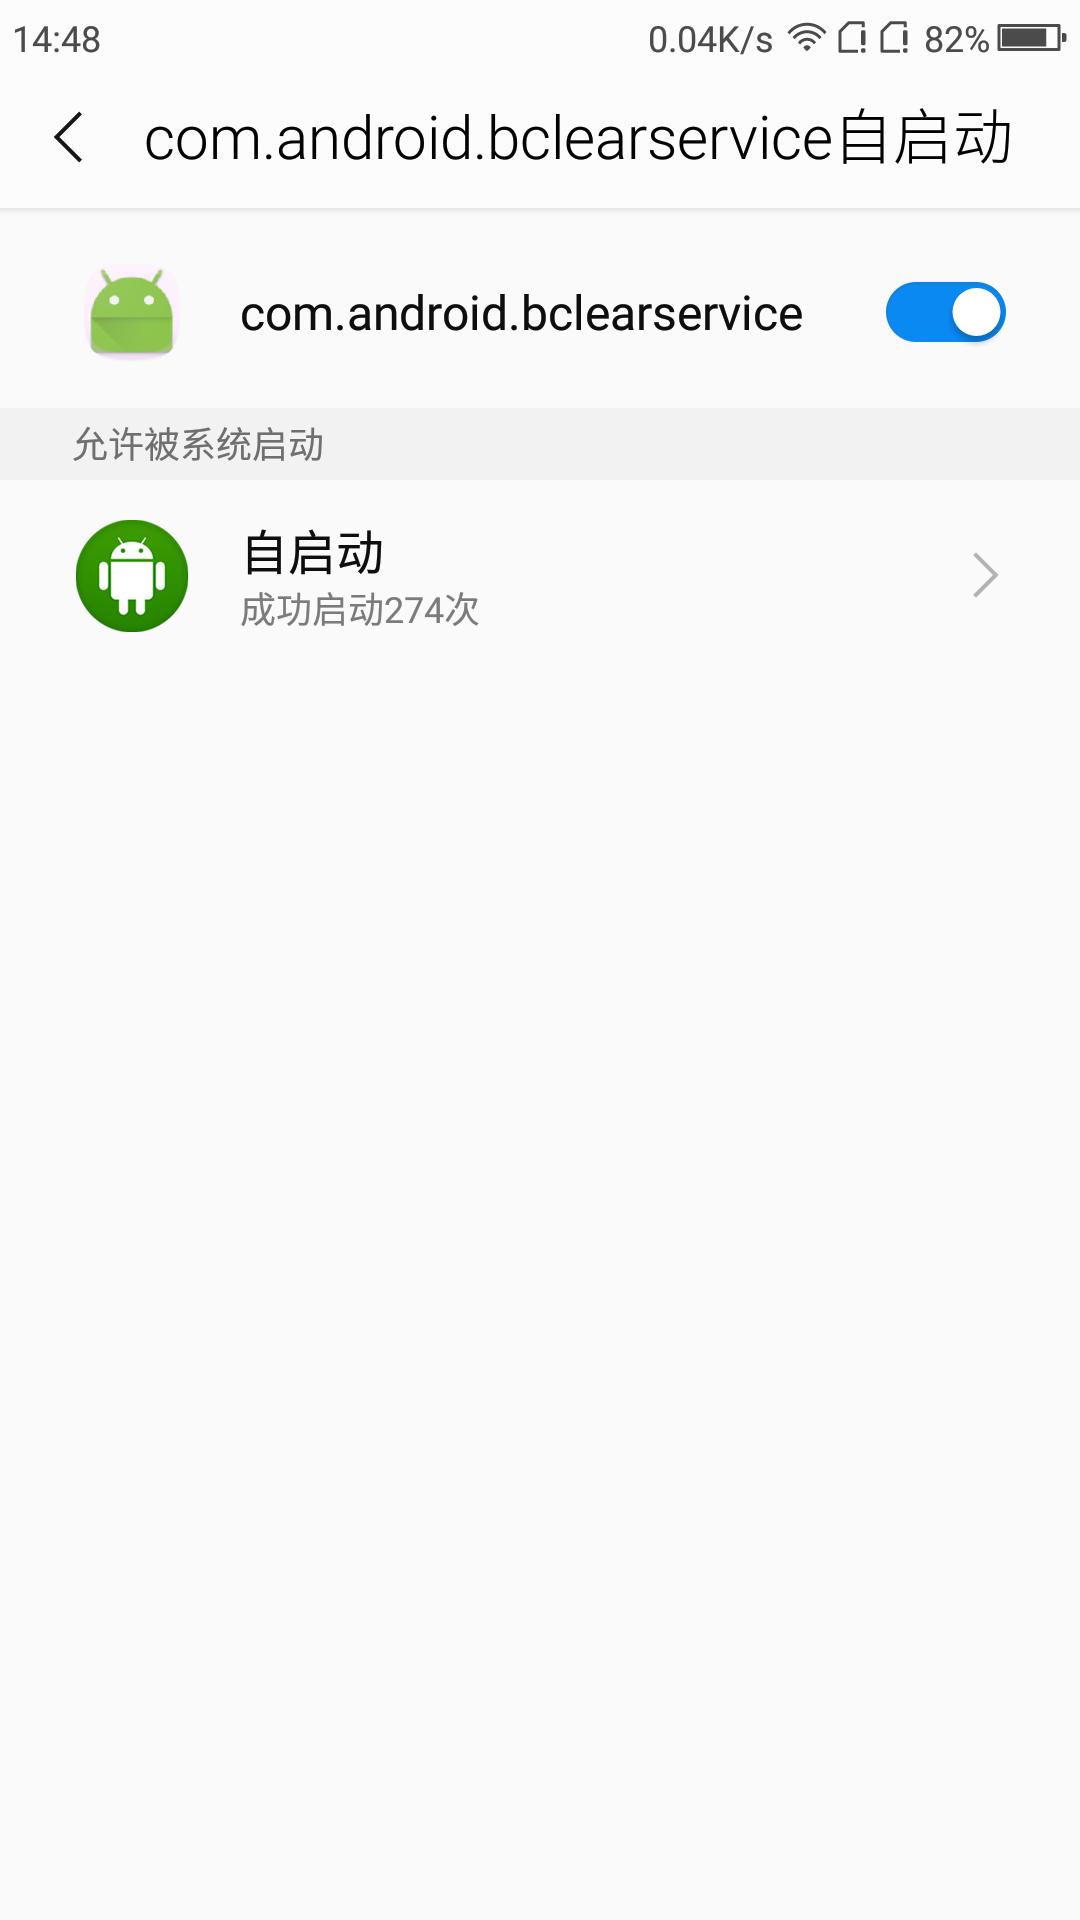 Screenshot_2018-11-13-14-48-16.png